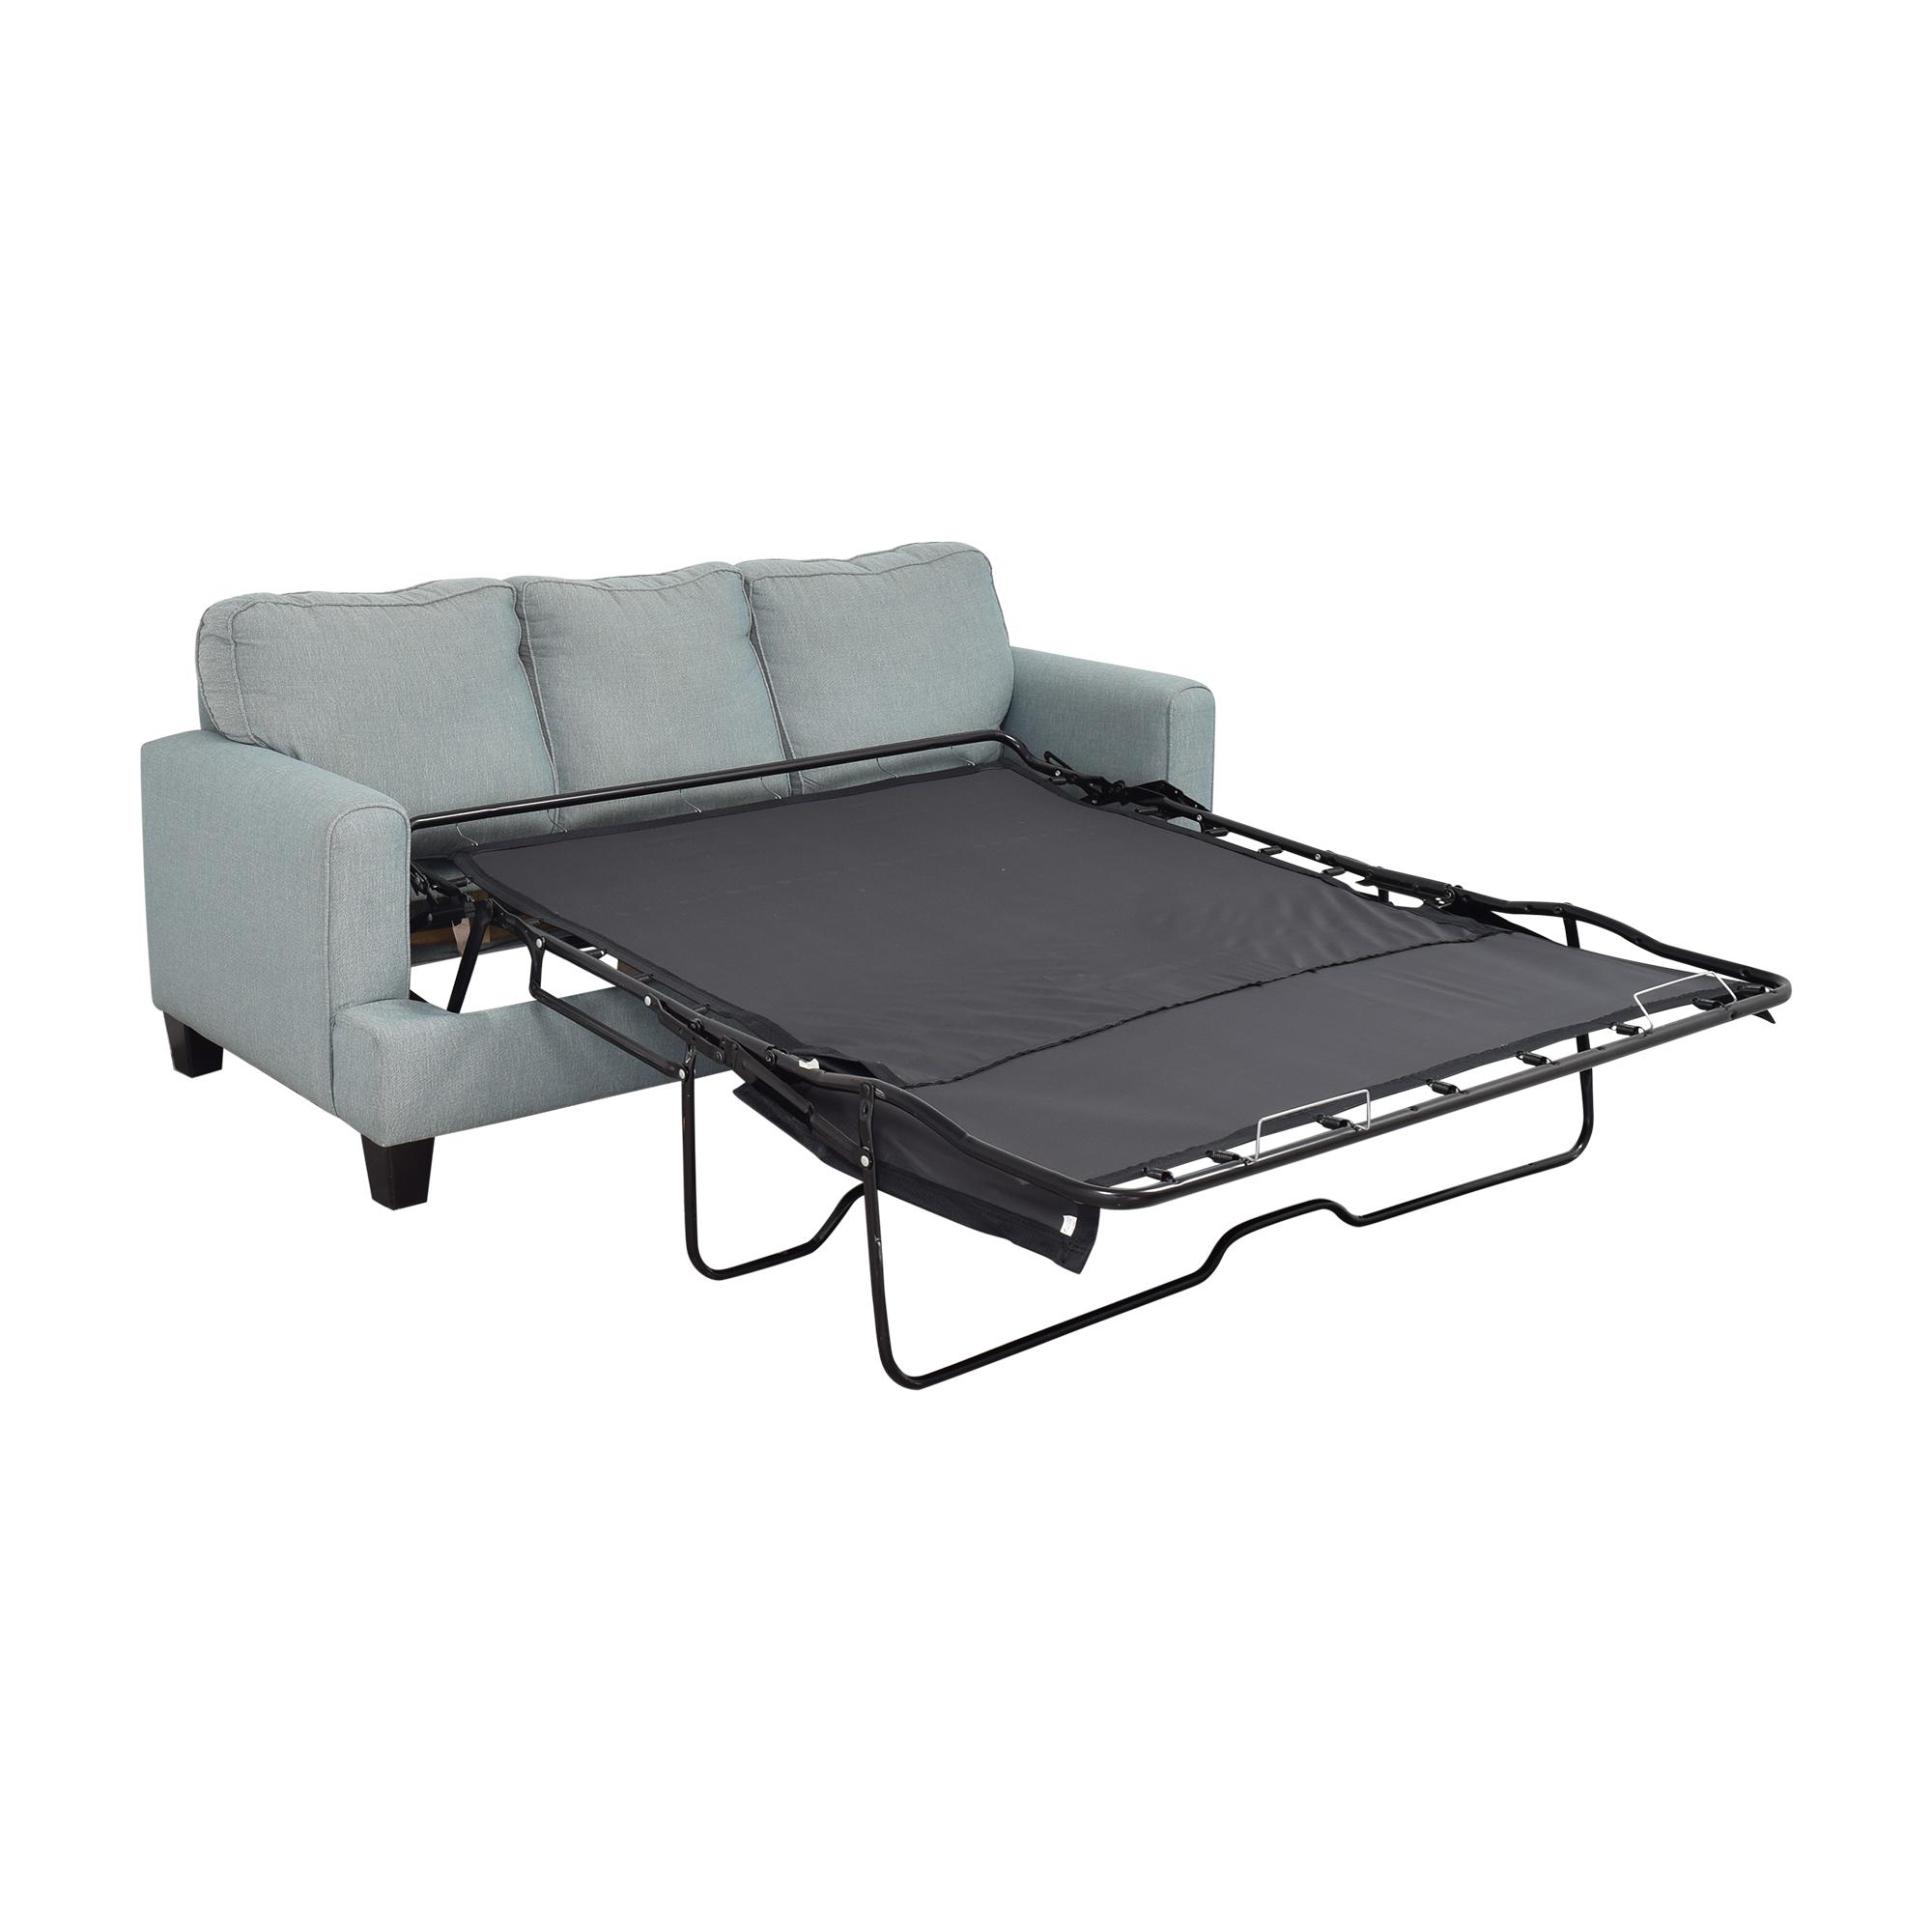 Raymour & Flanigan Raymour & Flanigan Sleeper Sofa dimensions